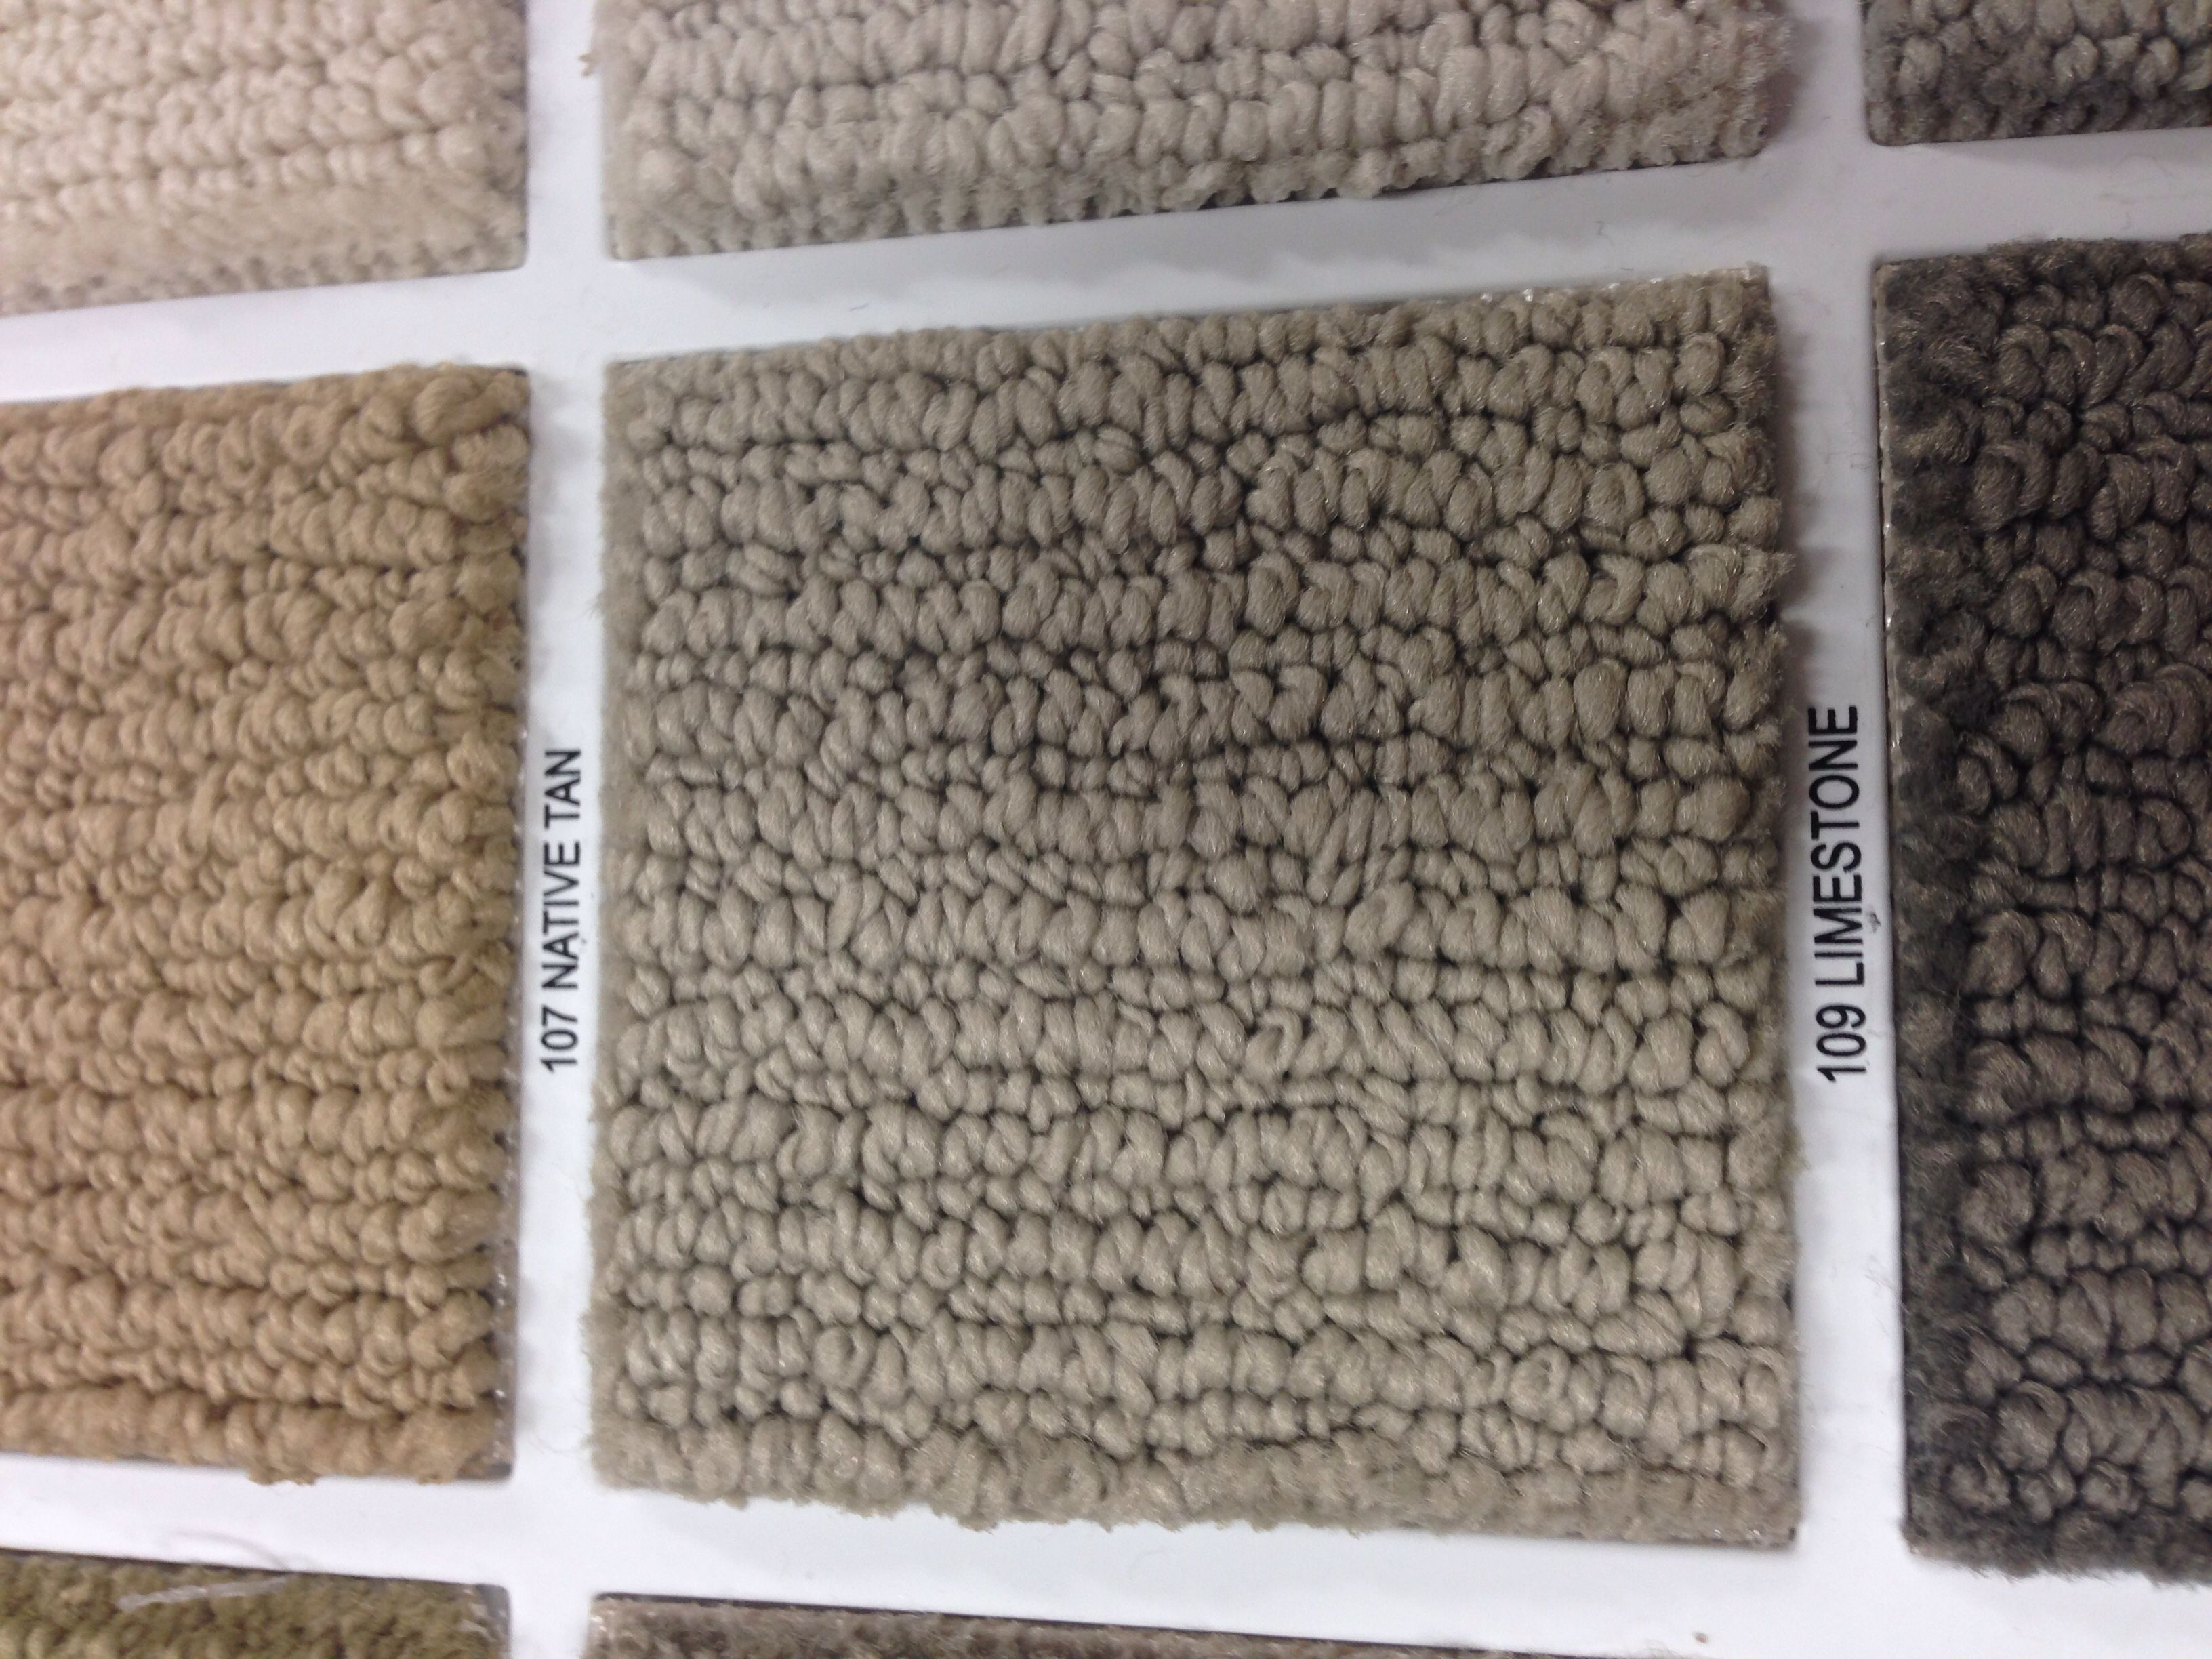 Shaw Carpet Color New House Home Decor Carpet